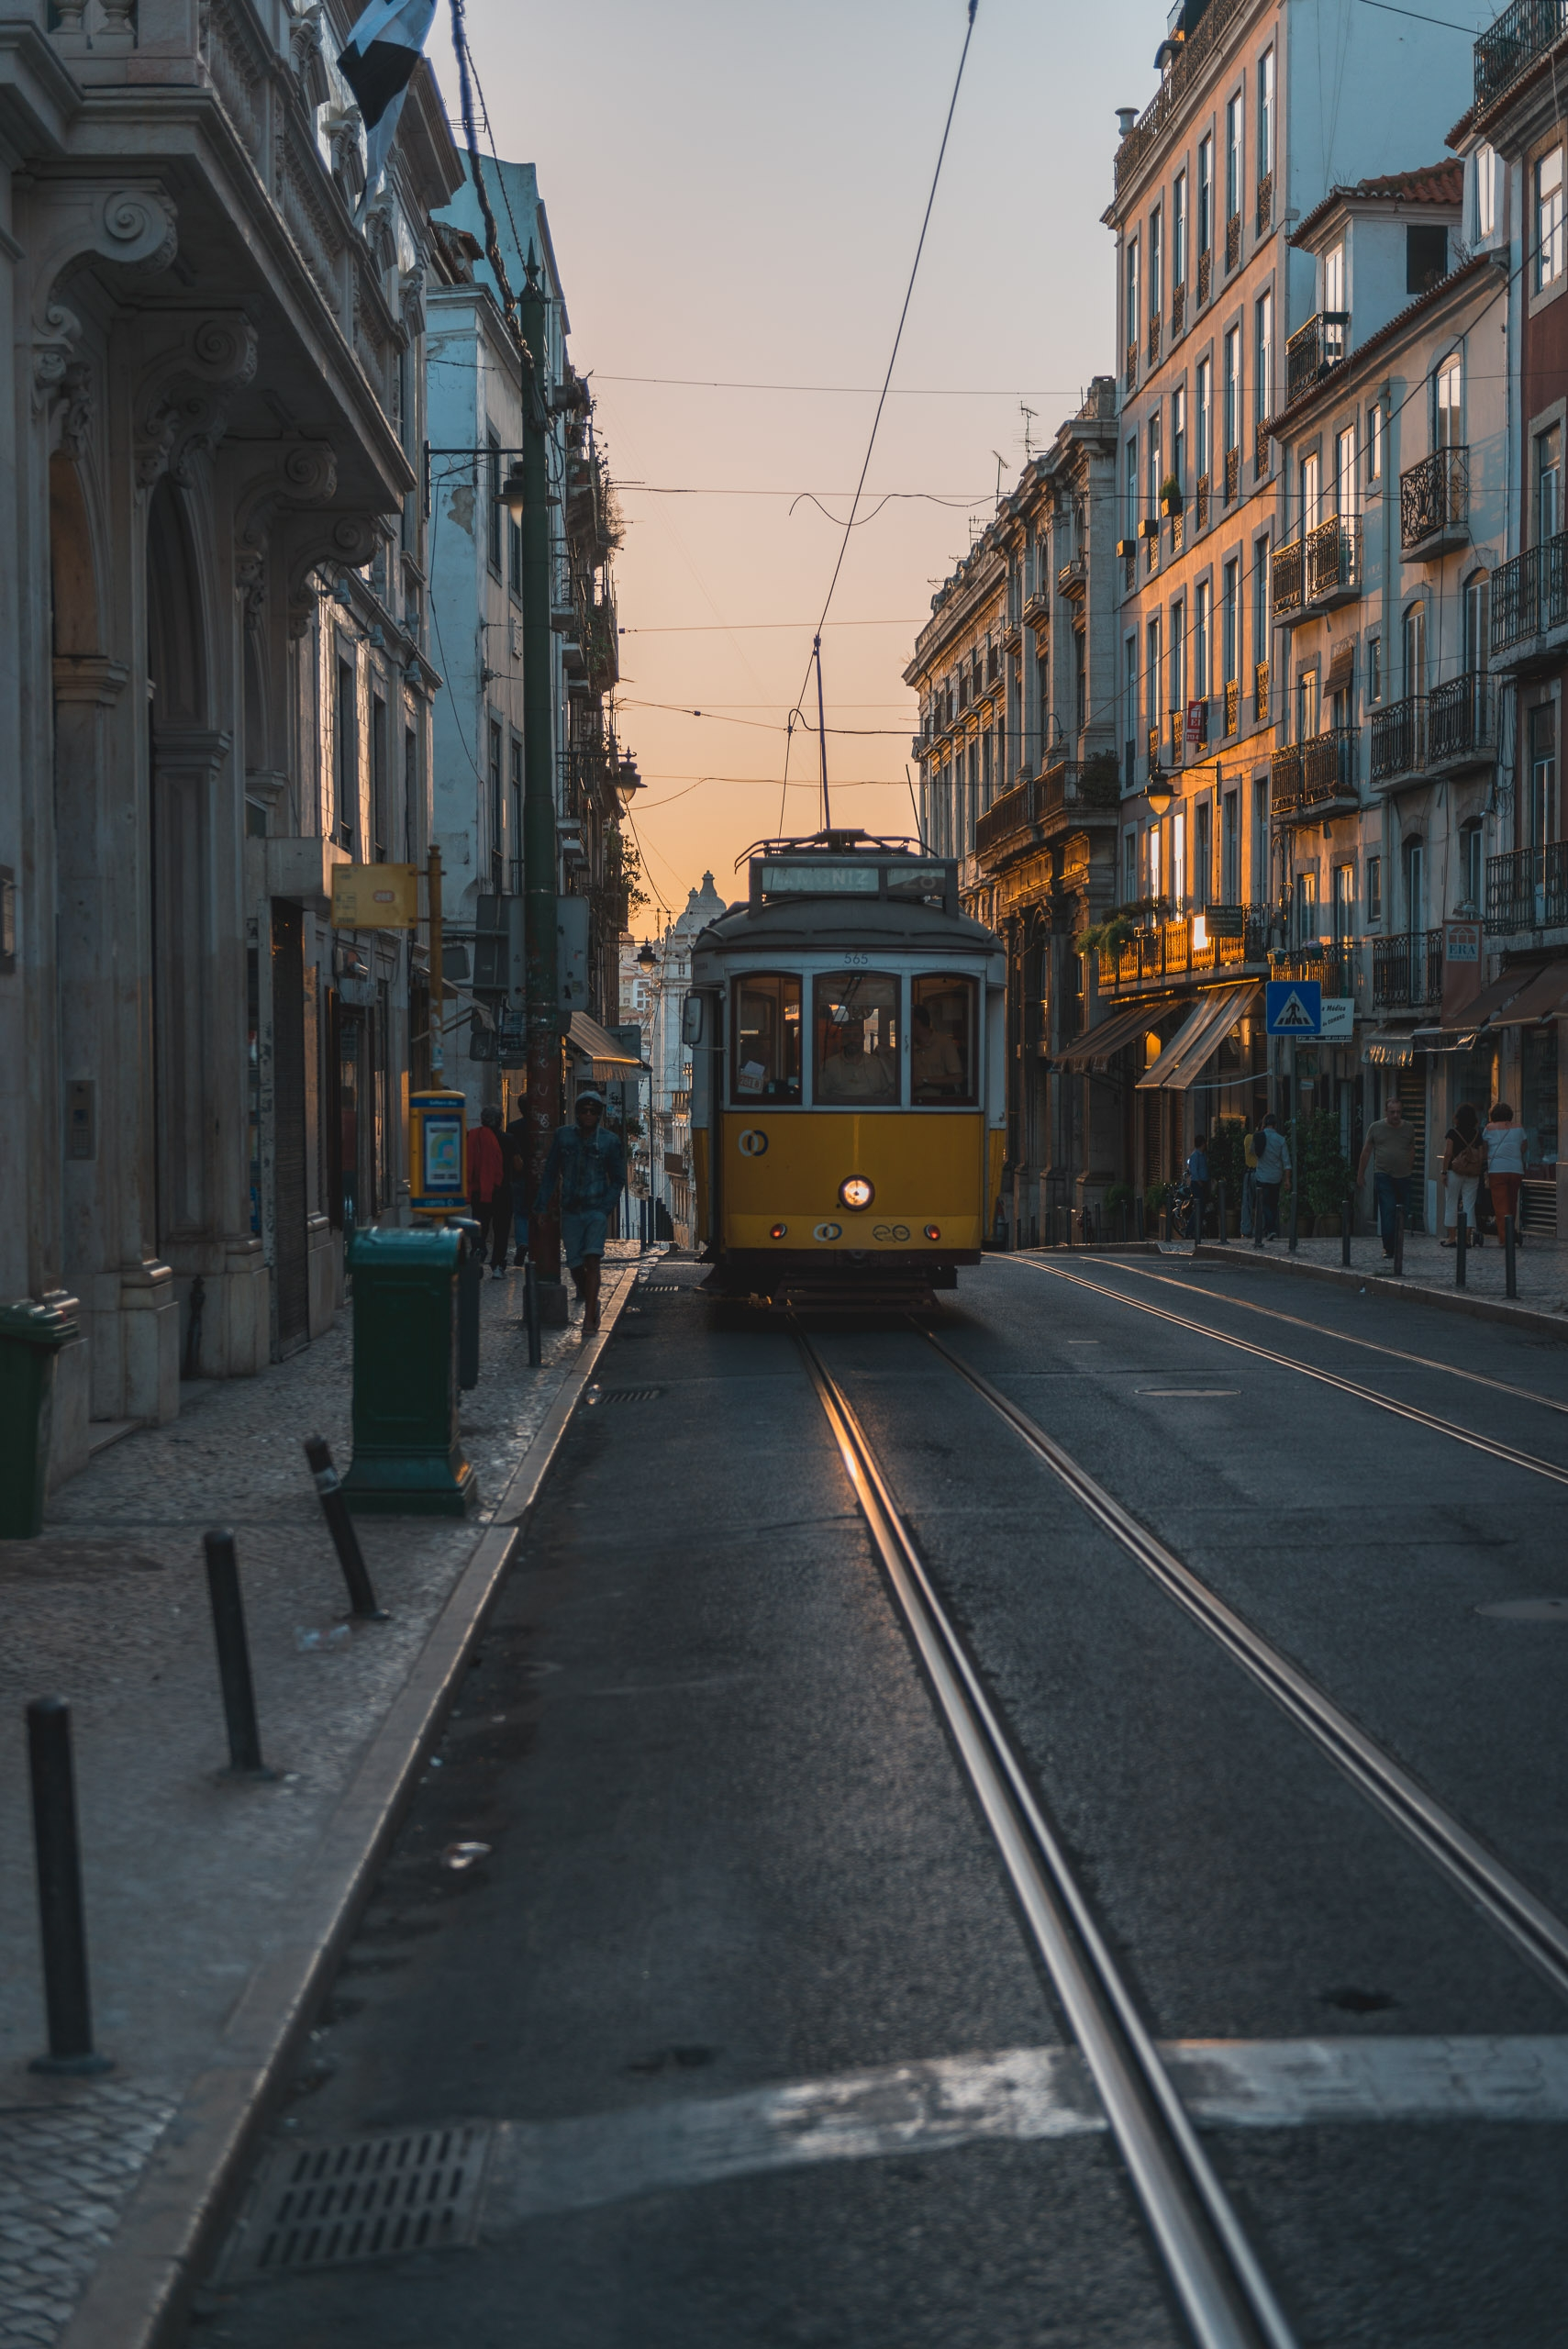 Portugal - Lisbon - 2012-0923-DSC_1634_52062